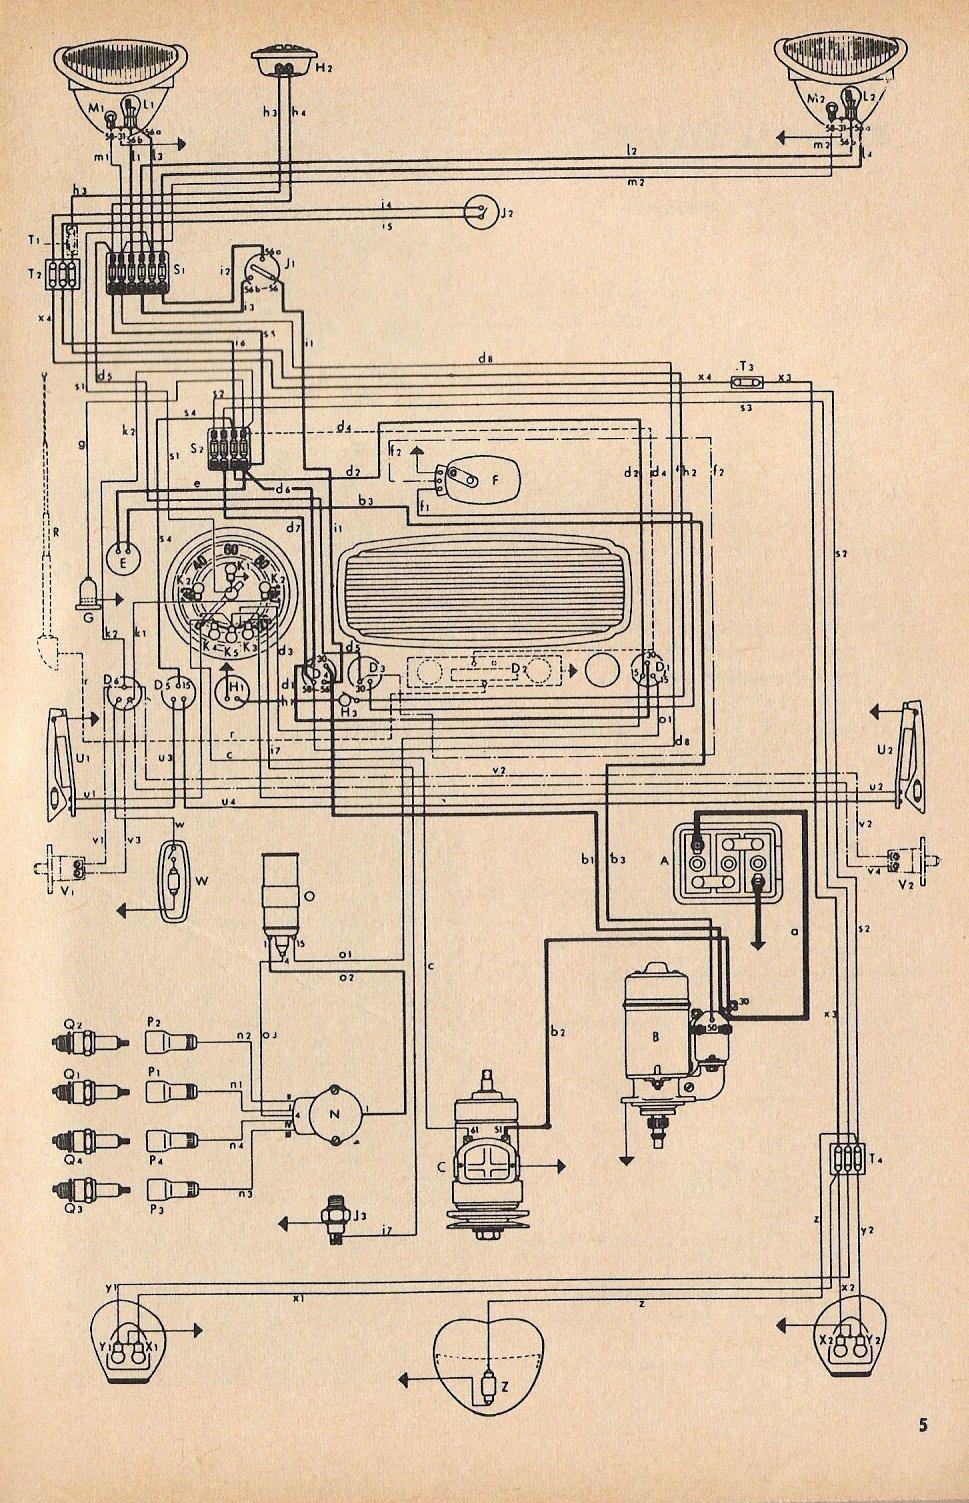 medium resolution of 71 vw super beetle wiring diagram type 3 get free image 1968 vw dash wiring vw dune buggy wiring schematic